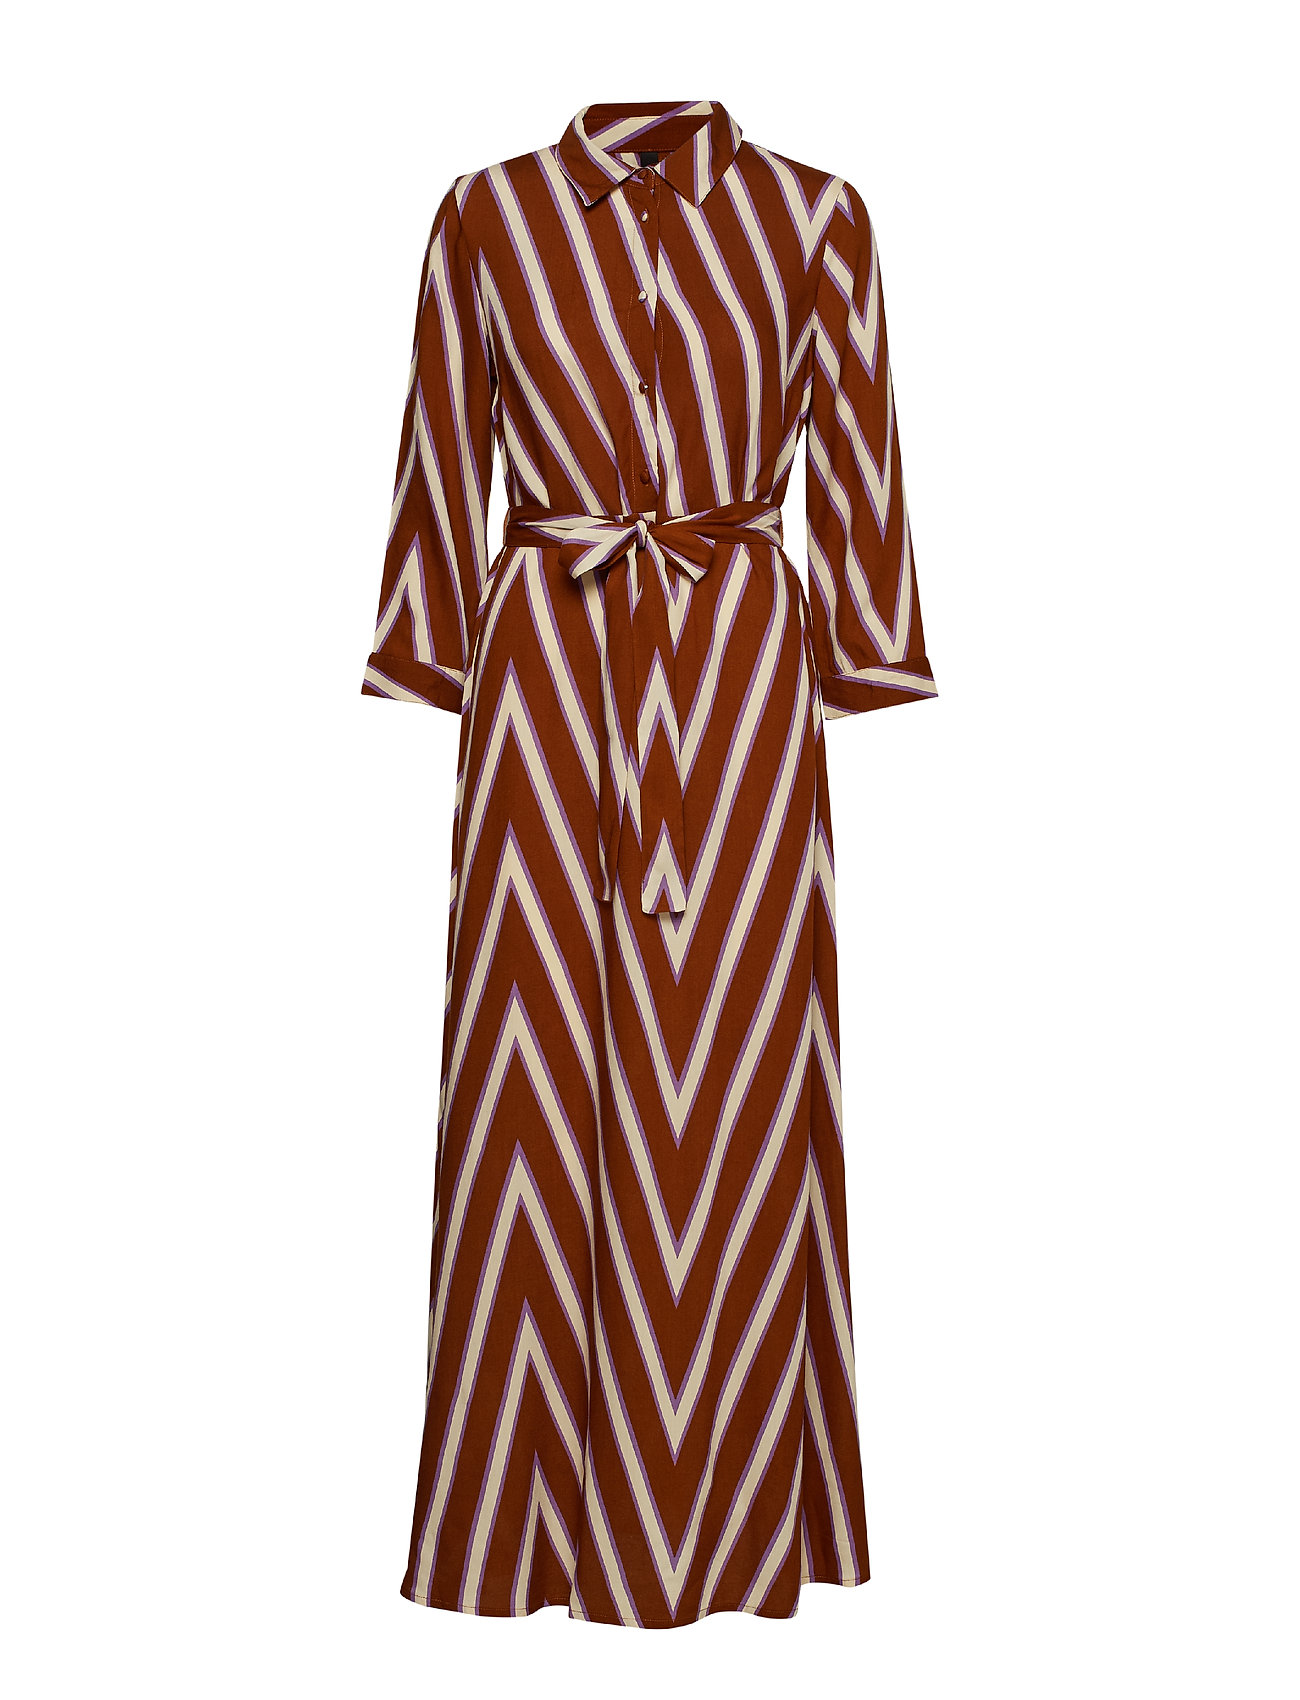 6856ac62 PAISLEY PURPLE Y.A.S Yasella Long Shirt Dress D2d maxikjoler for ...